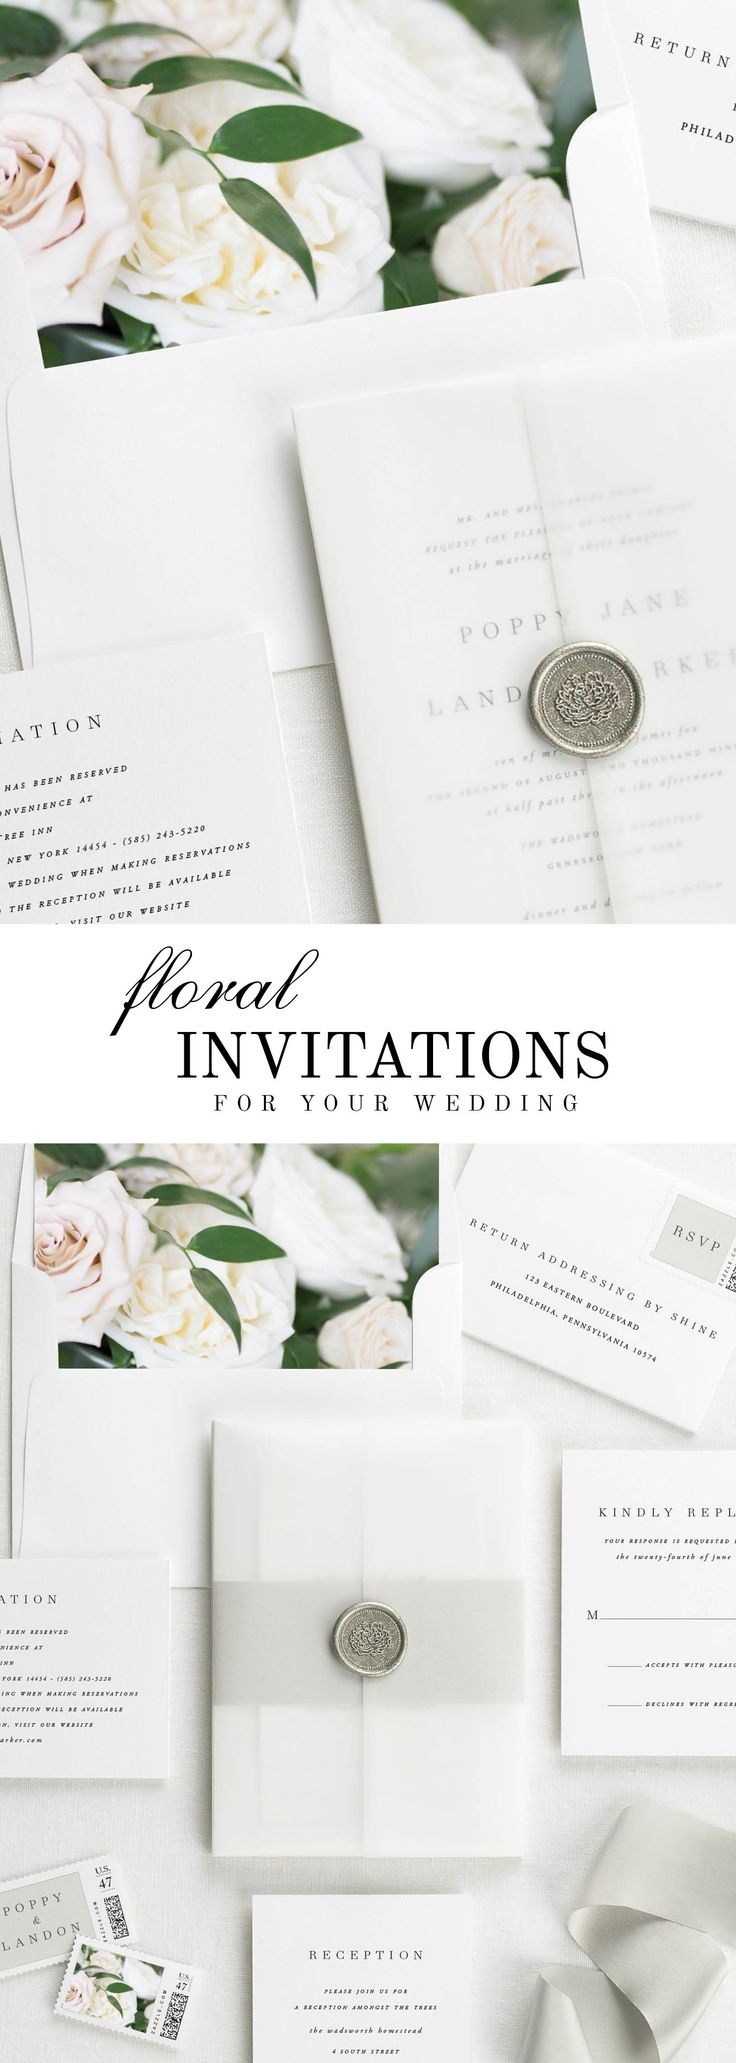 4848 Best Wedding Invitation Images On Pinterest Wedding